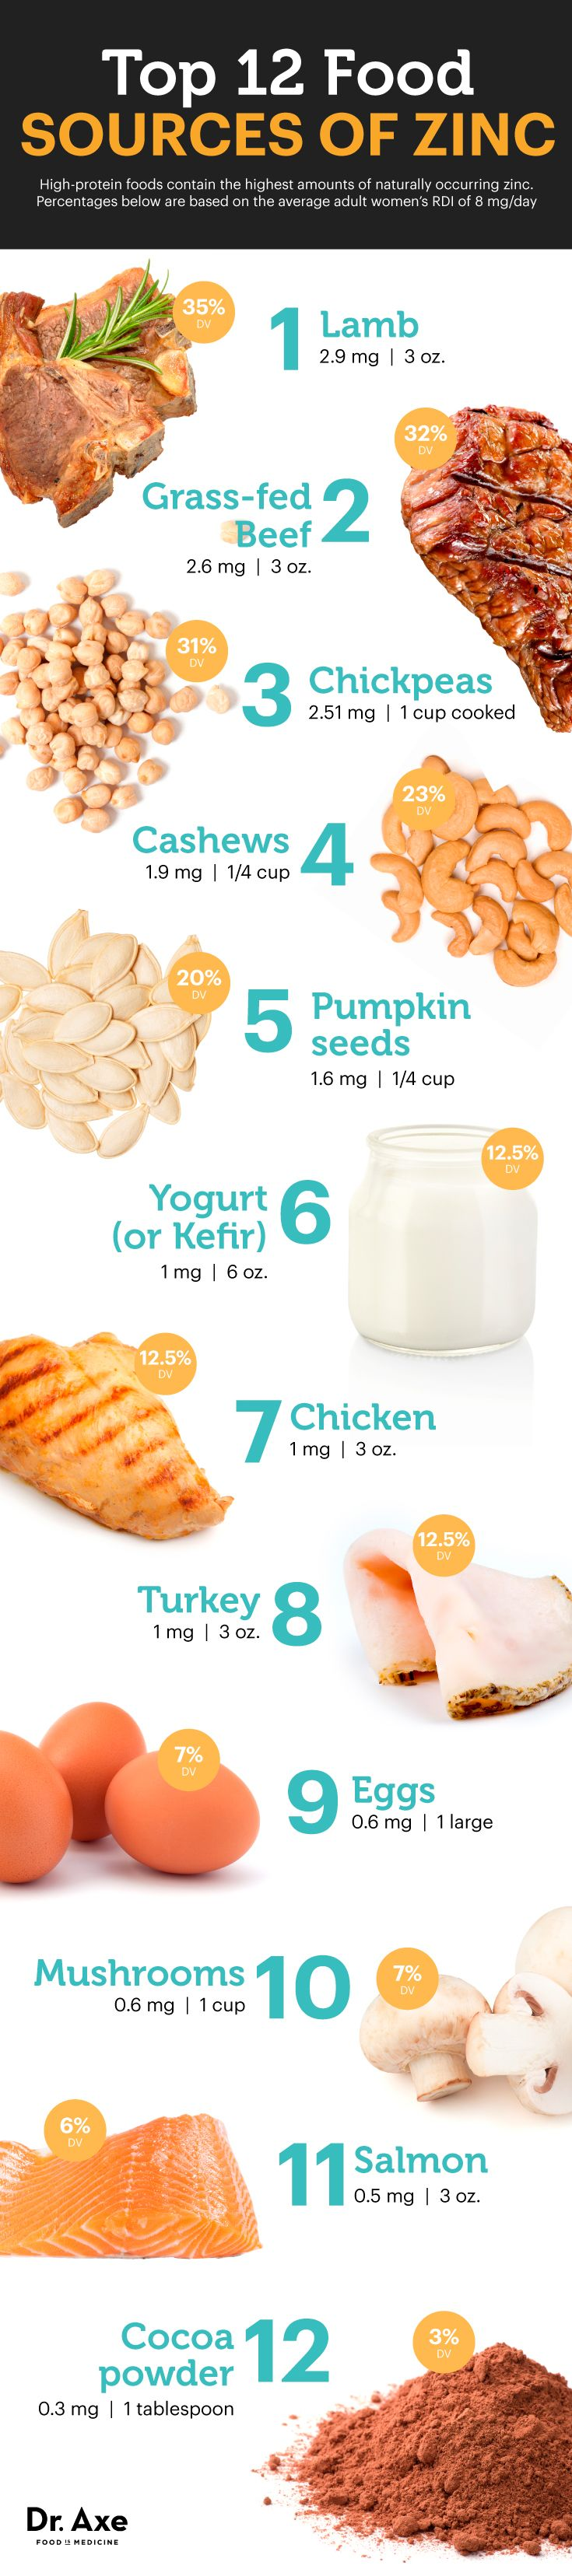 Best 25+ Natures way foods ideas on Pinterest